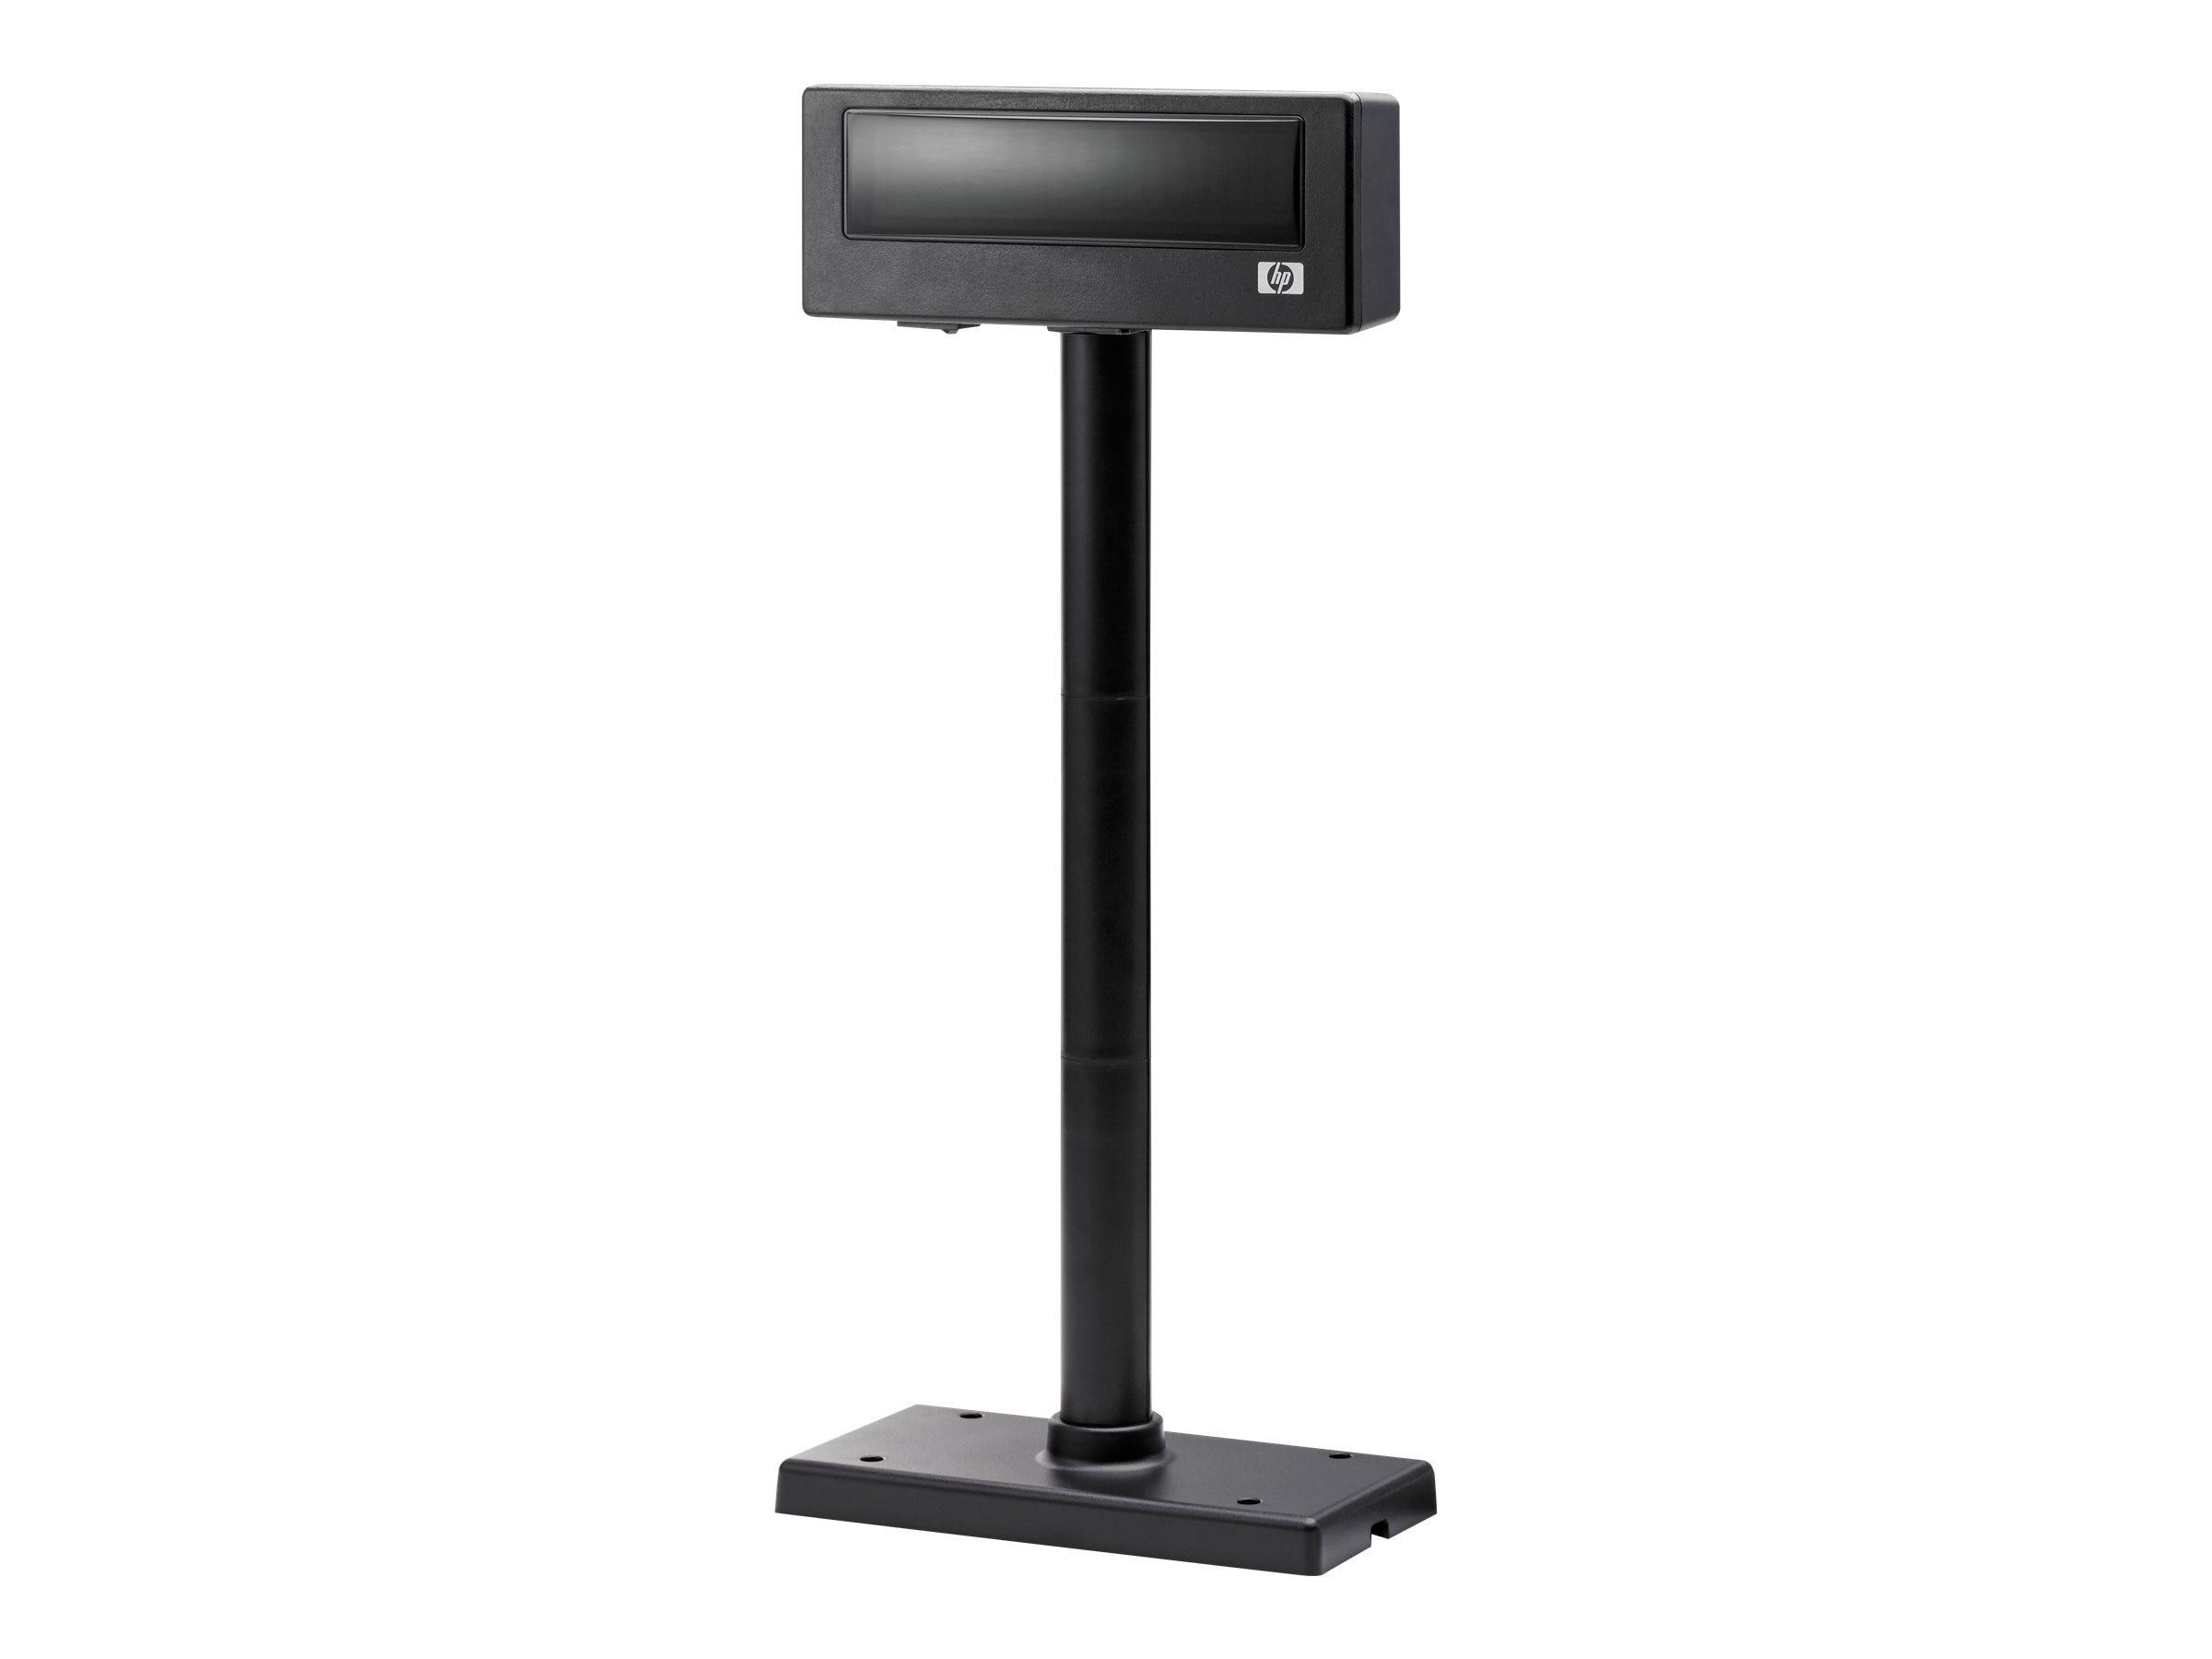 HP POS Pole Display, FK225AT, 9198439, POS Pole Displays